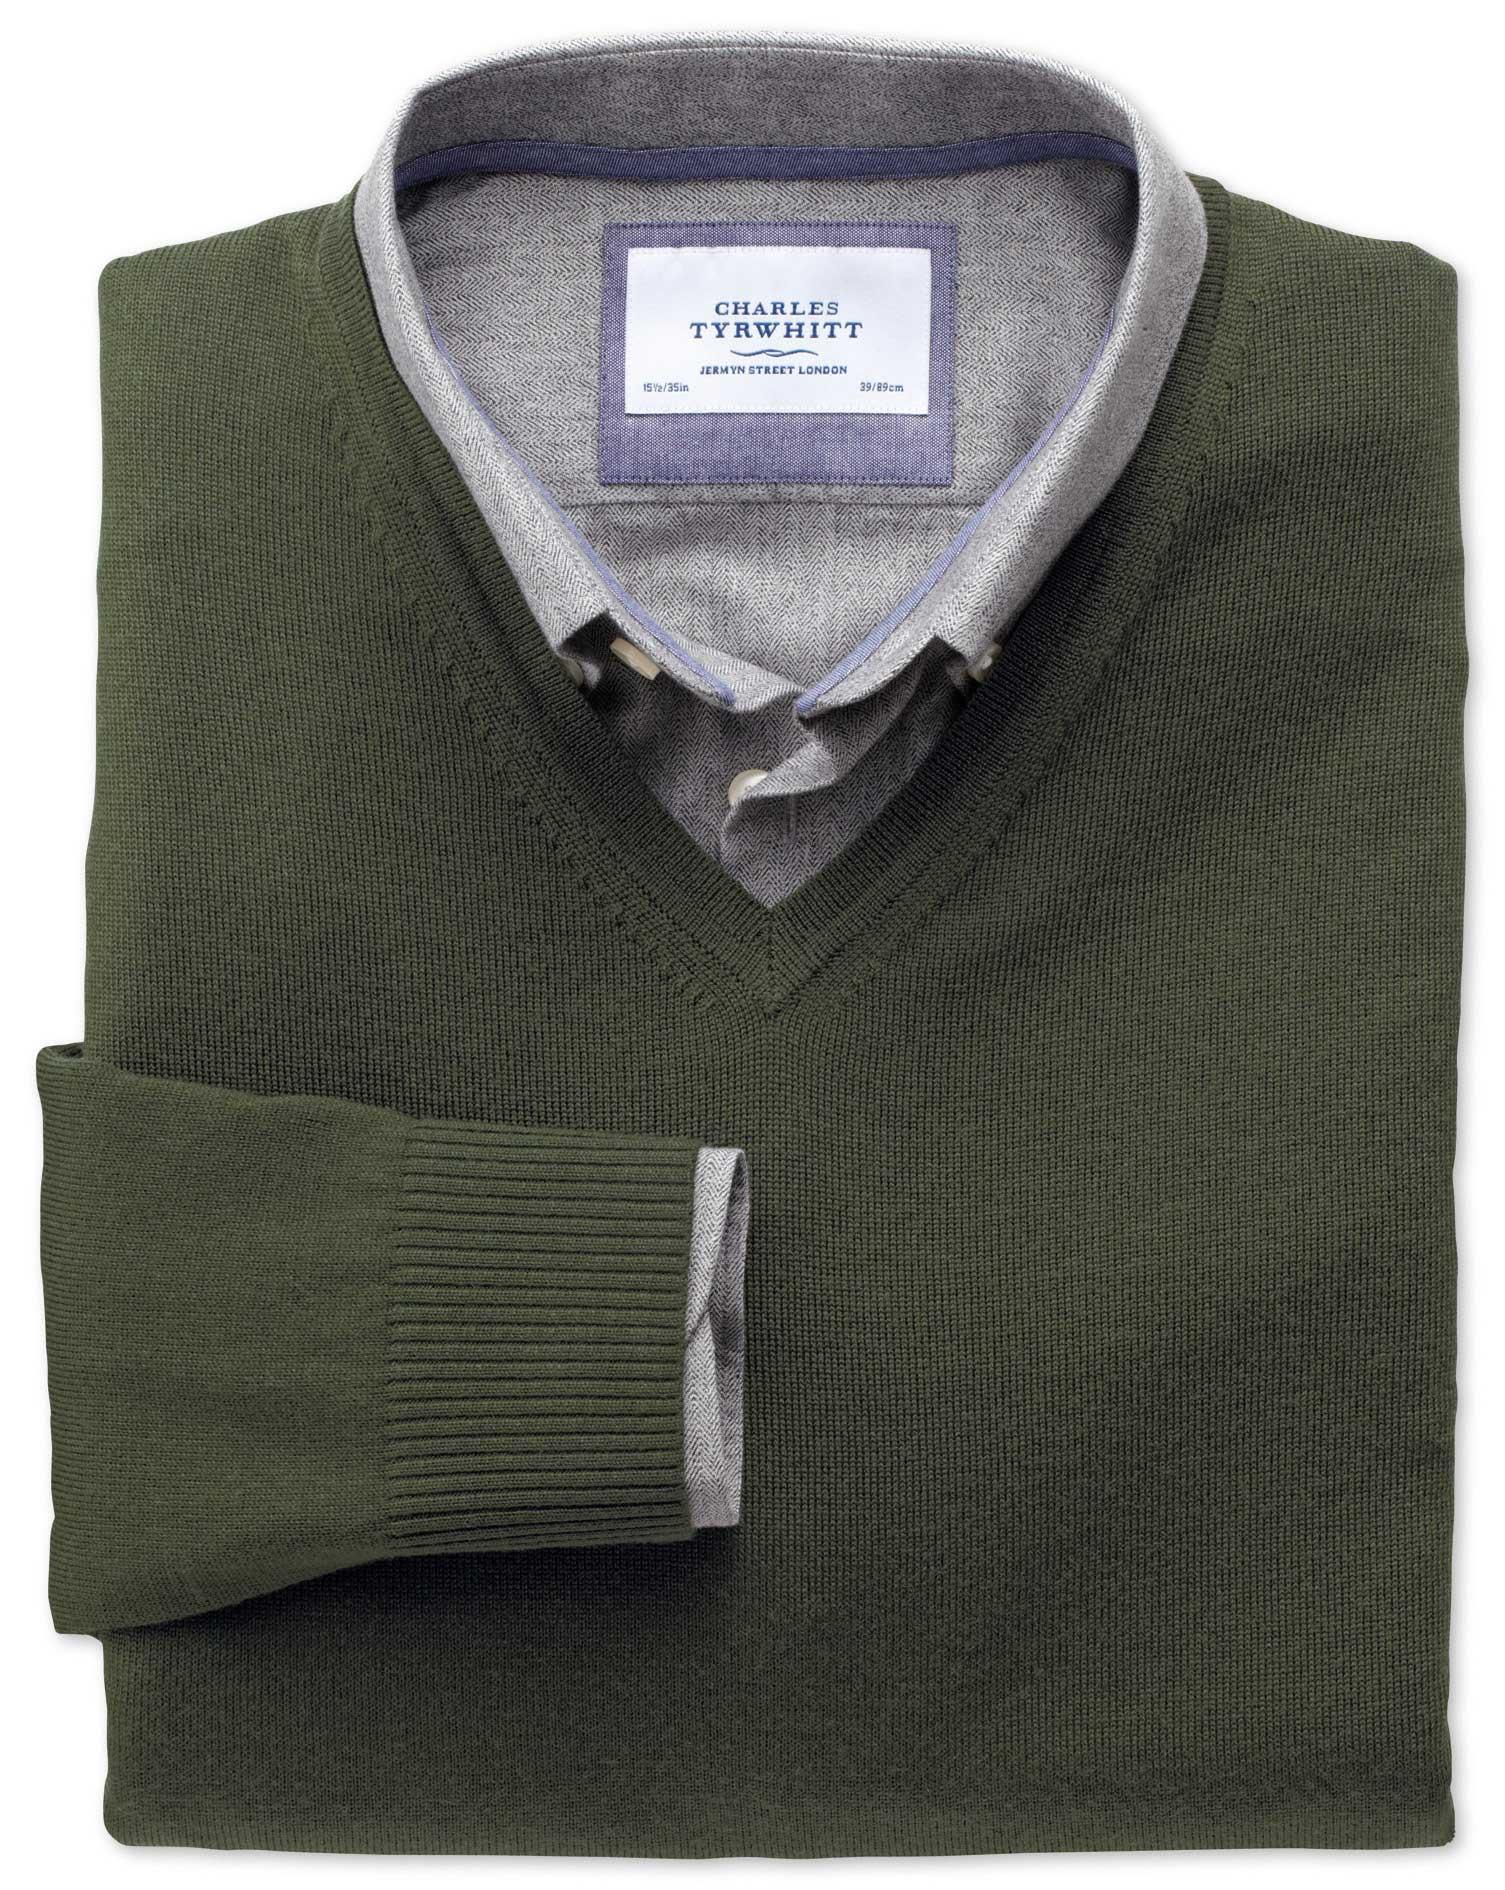 Dark Green Merino V-Neck Wool Jumper Size Small by Charles Tyrwhitt